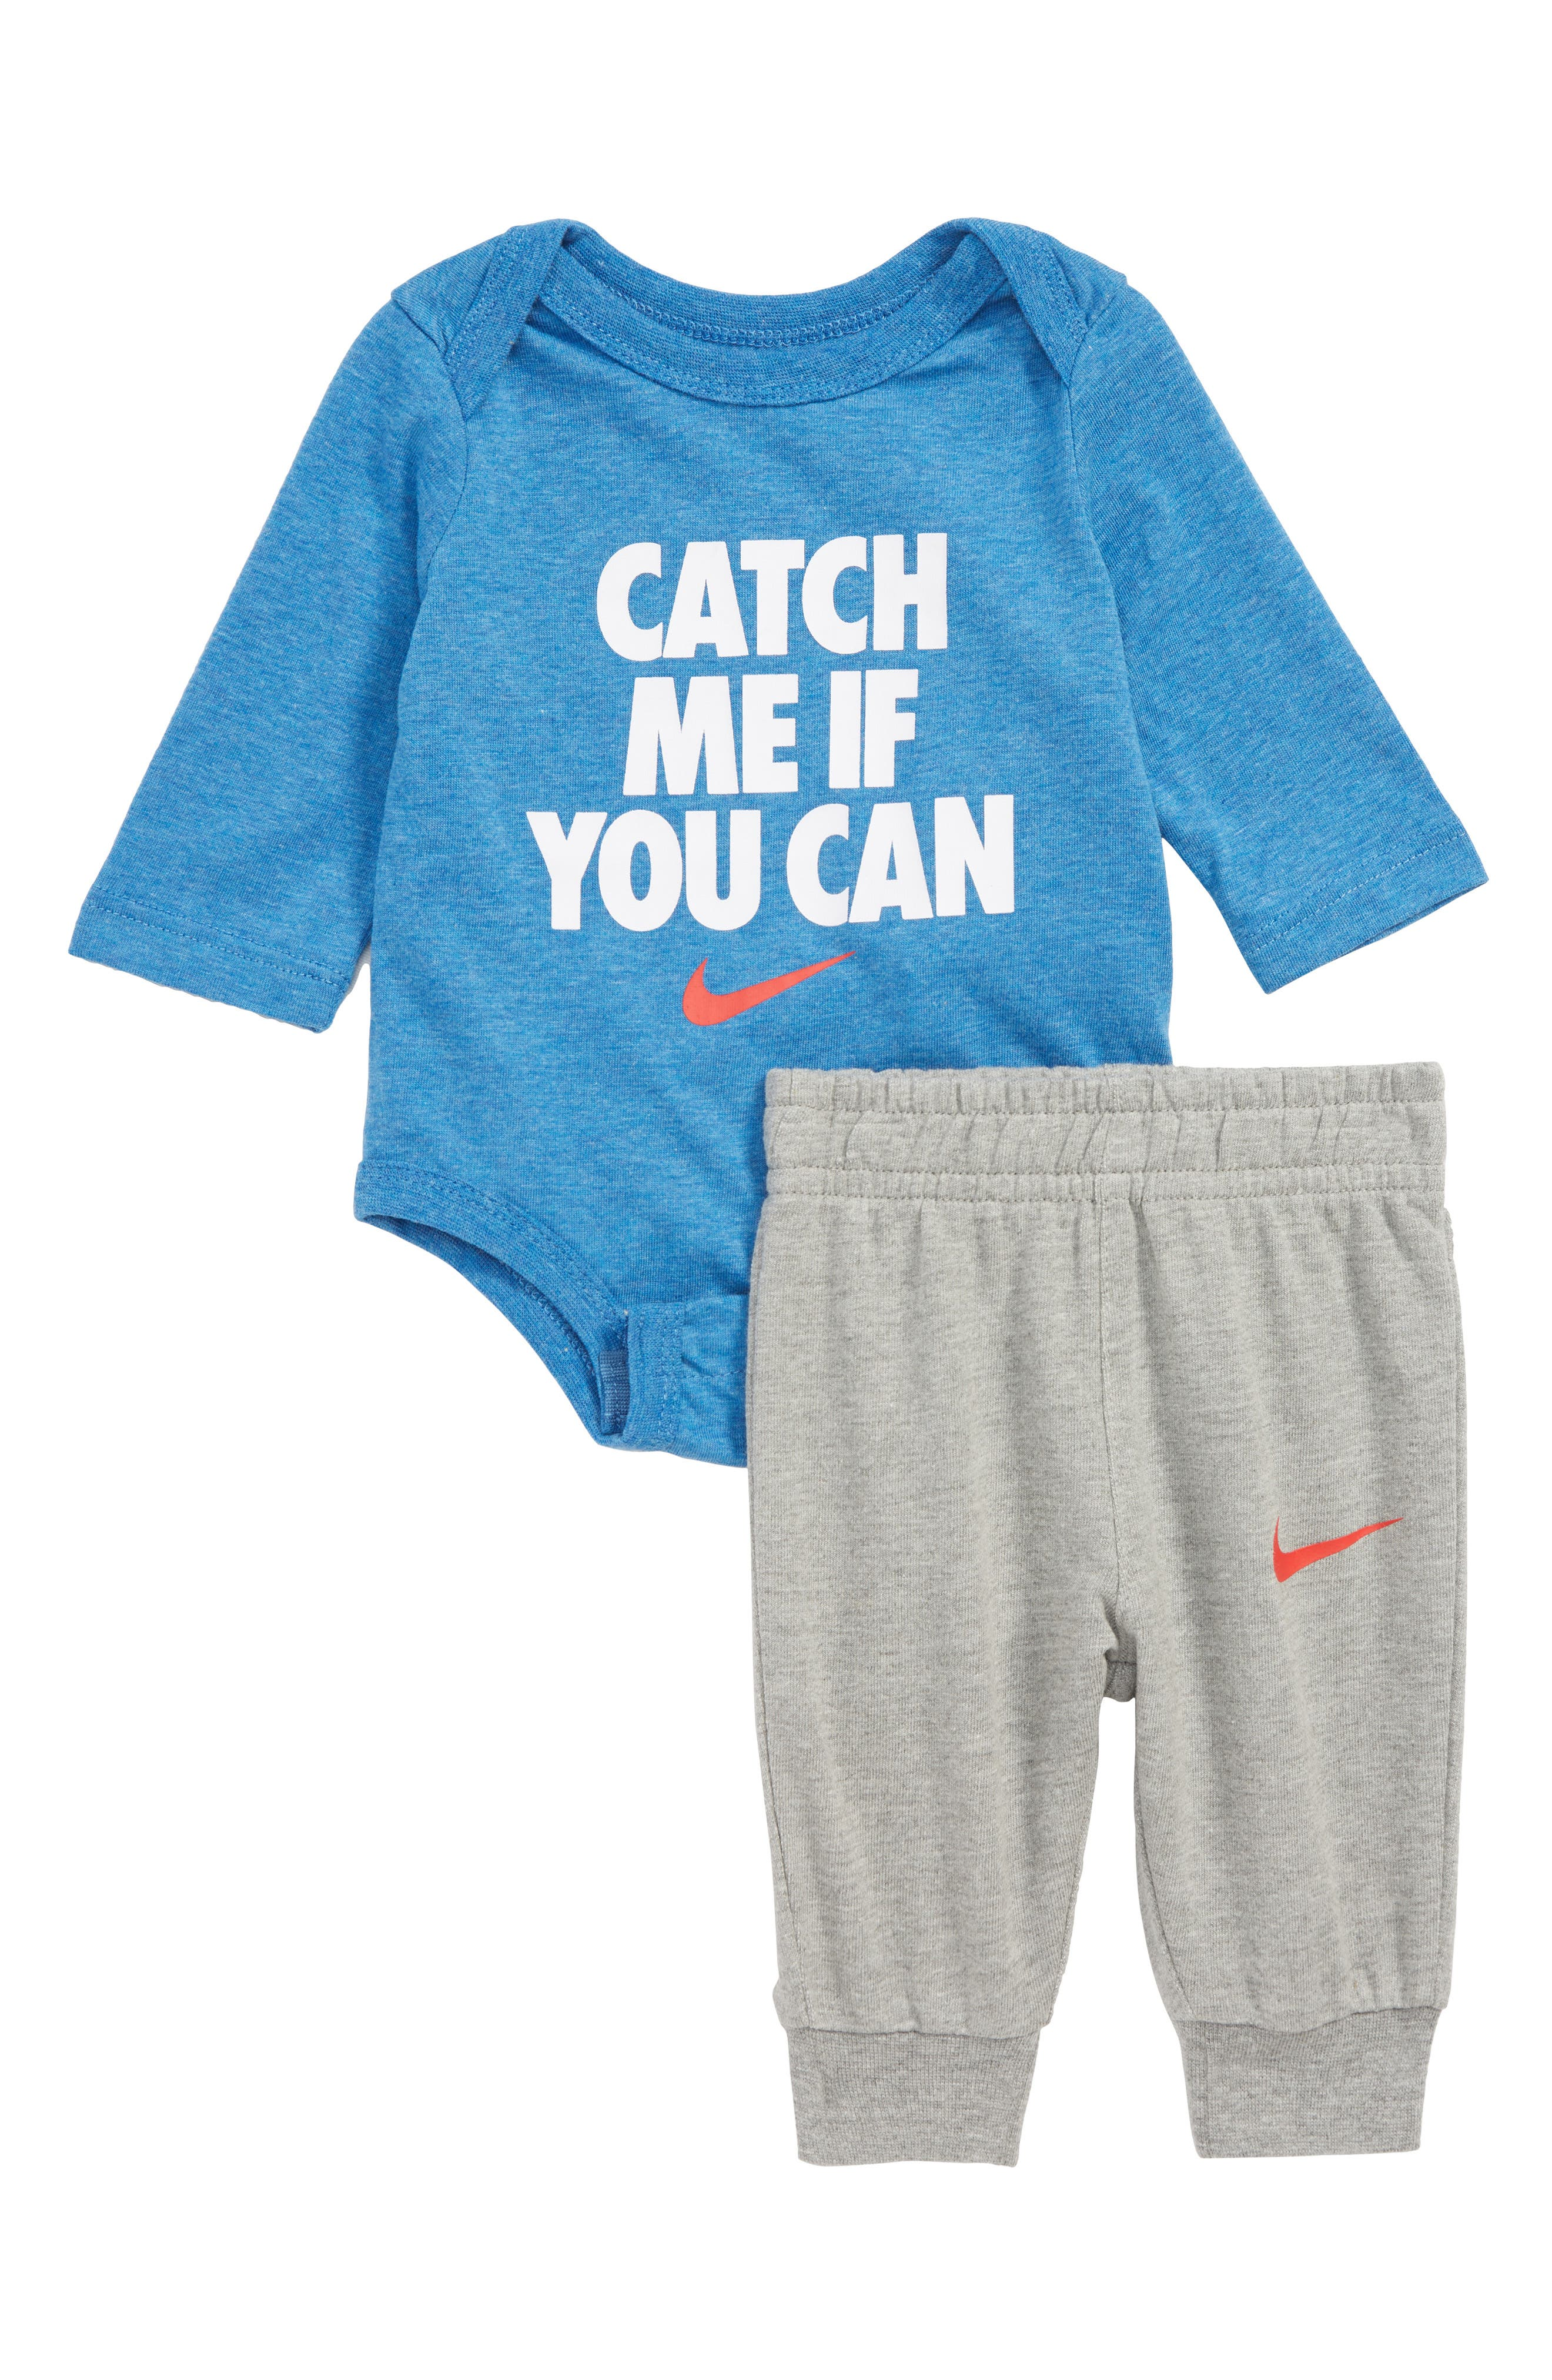 Catch Me If You Can Bodysuit & Pants Set,                         Main,                         color, 088